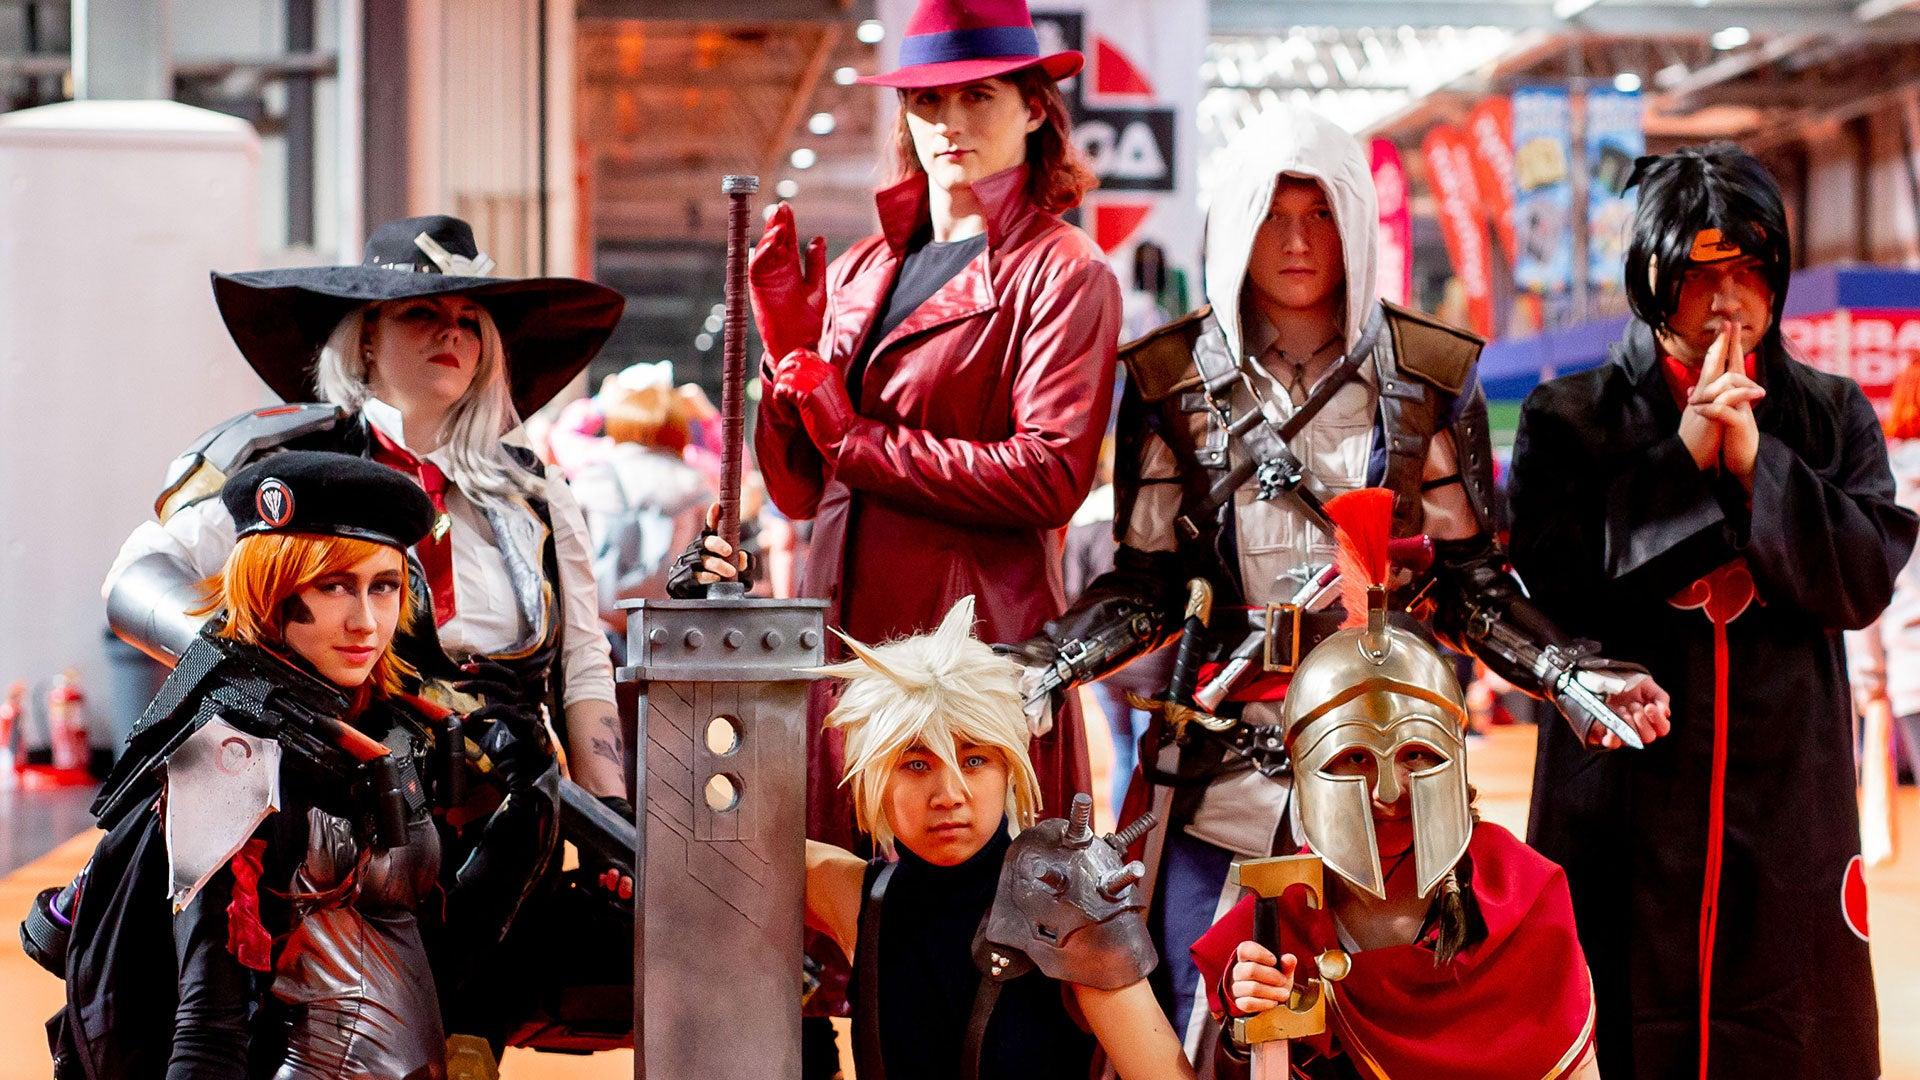 Cosplayers at MCM Birmingham Comic Con